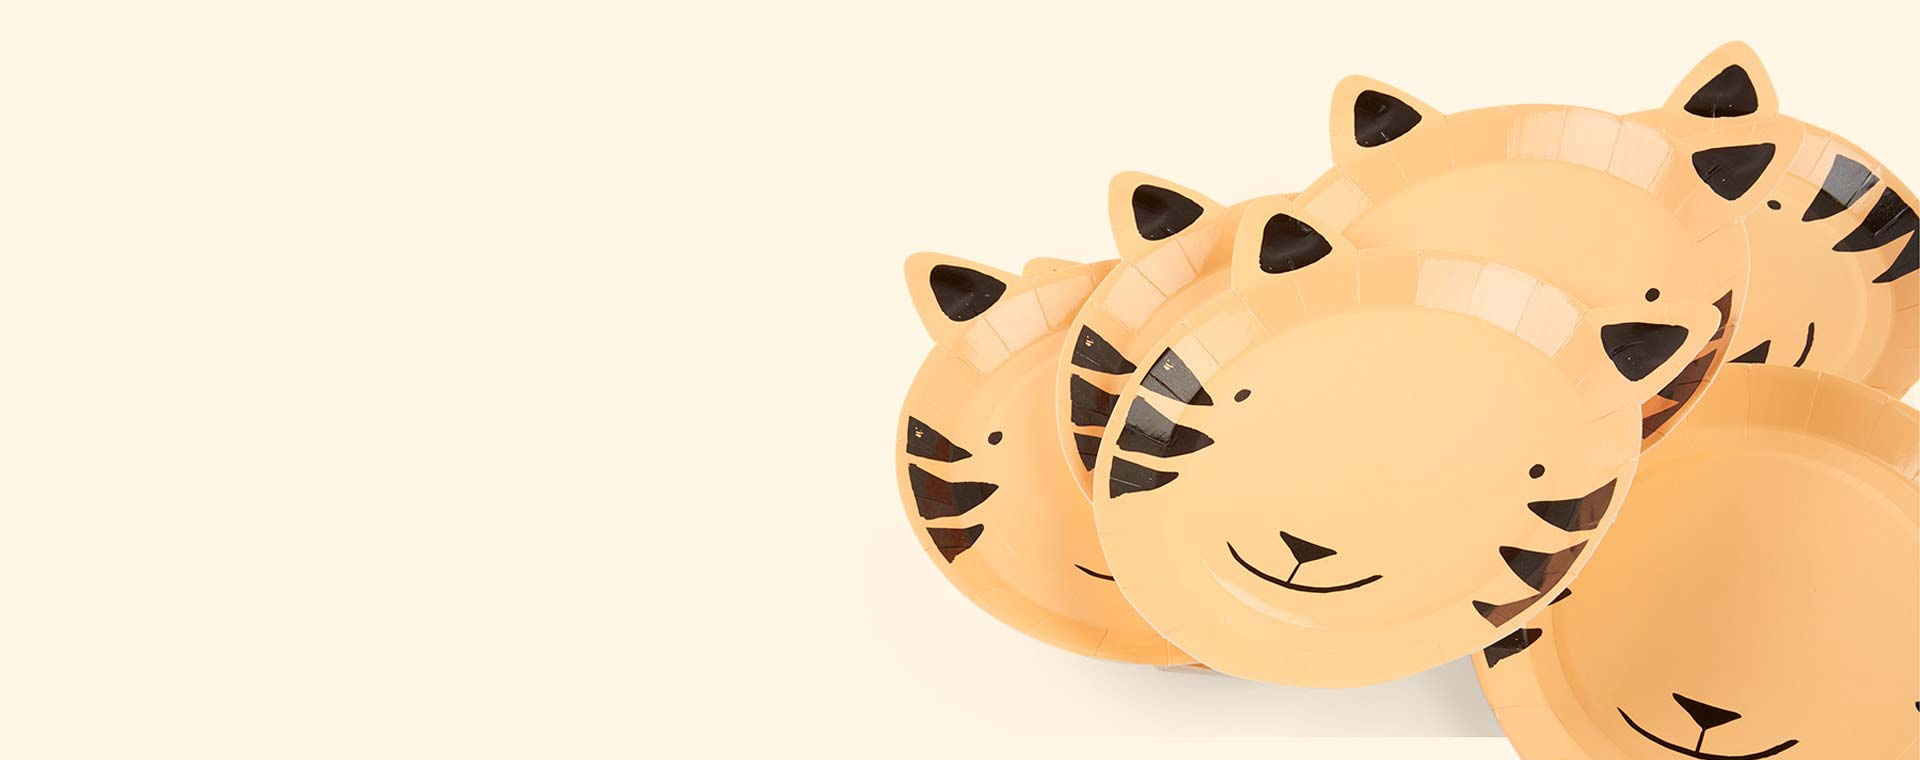 Tiger Meri Meri Tiger Plate